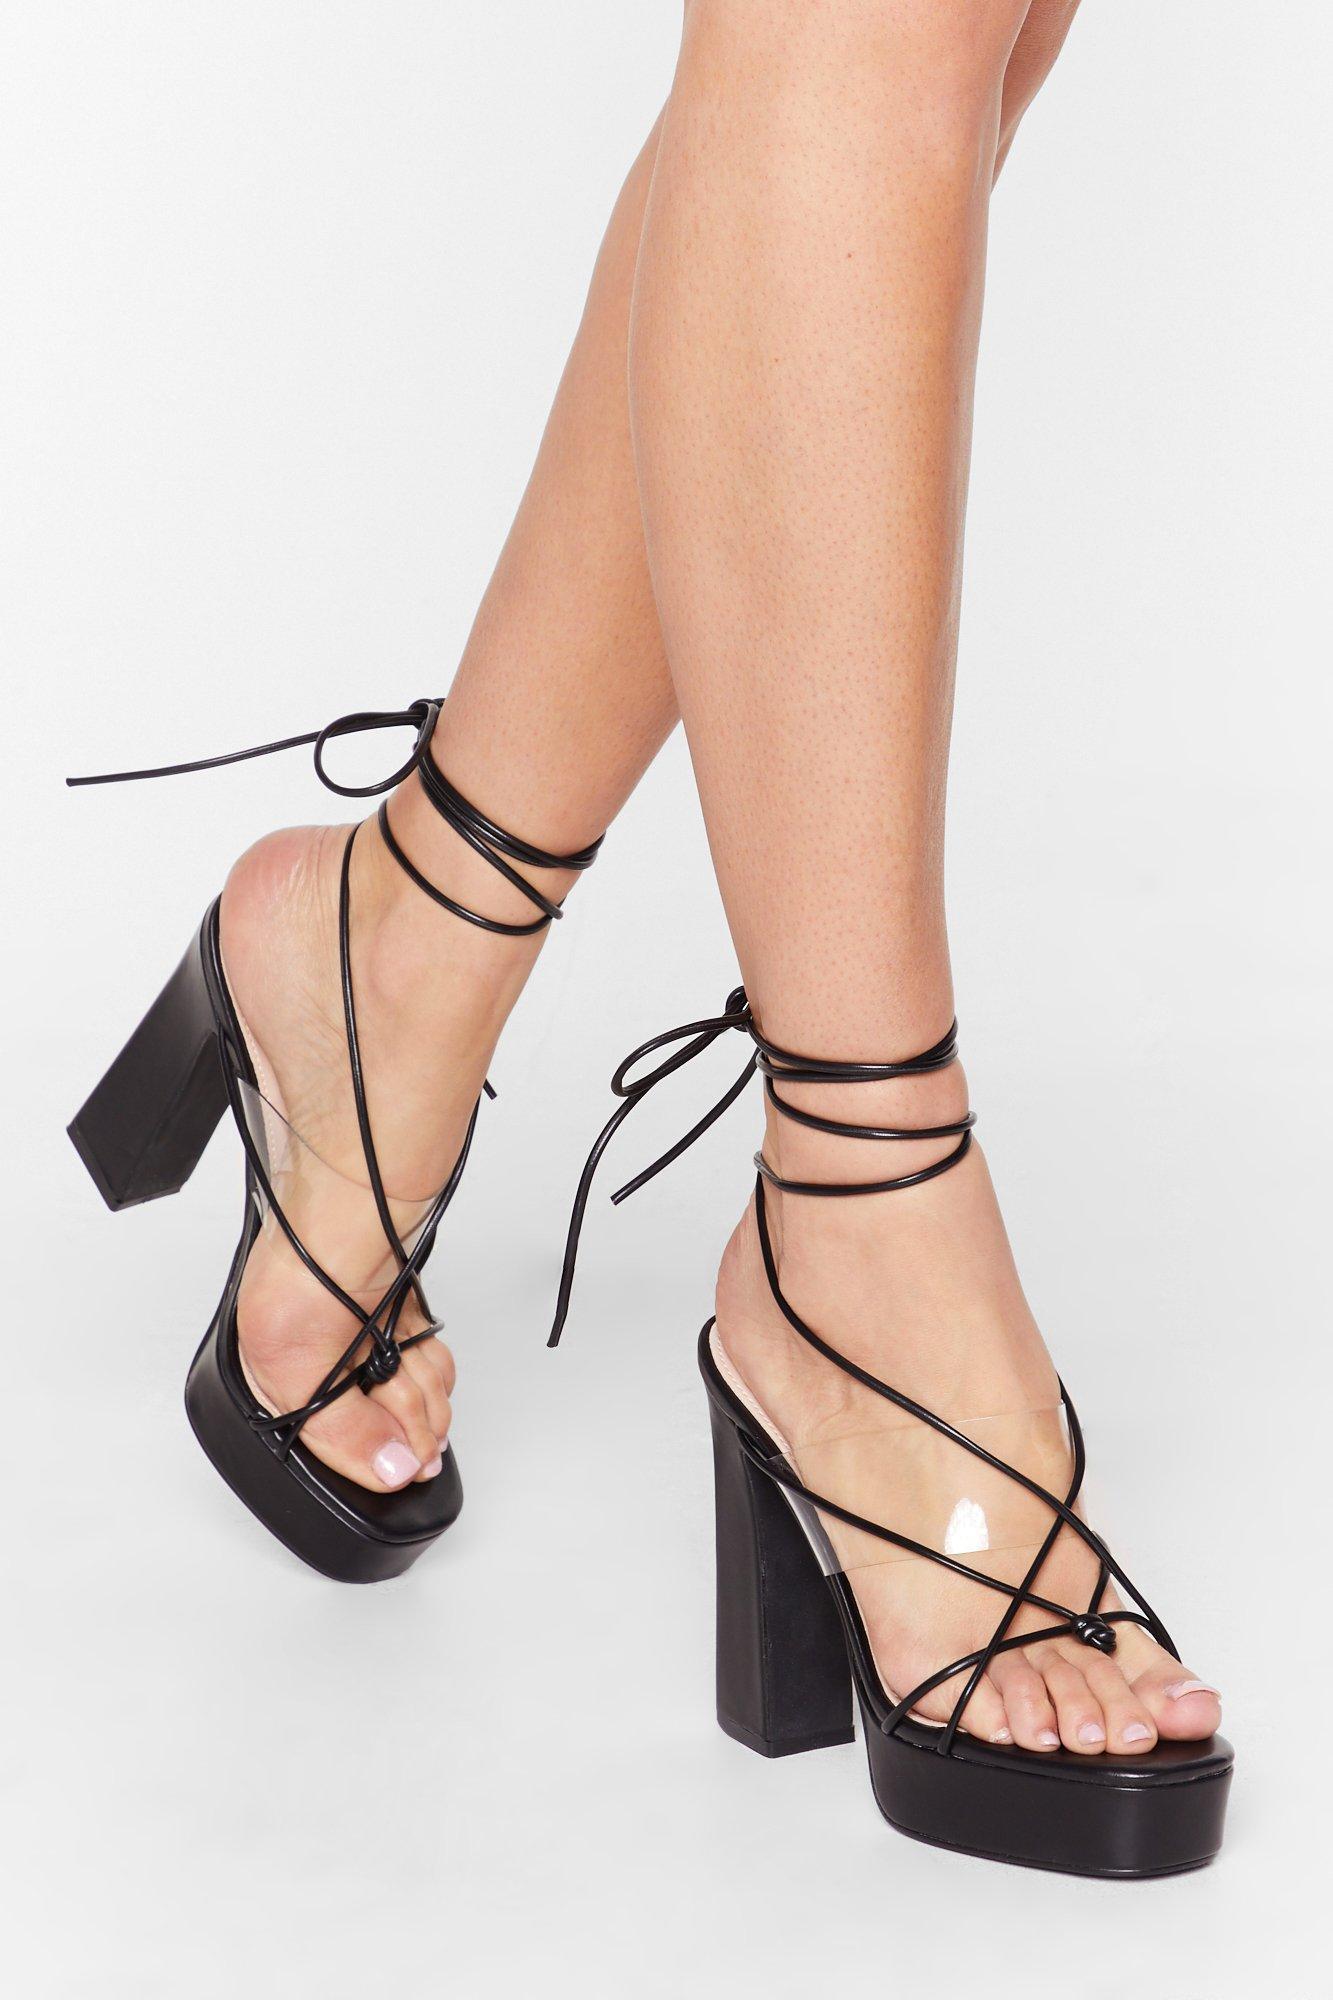 Image of Come Back Tie Mine Clear Platform Heels